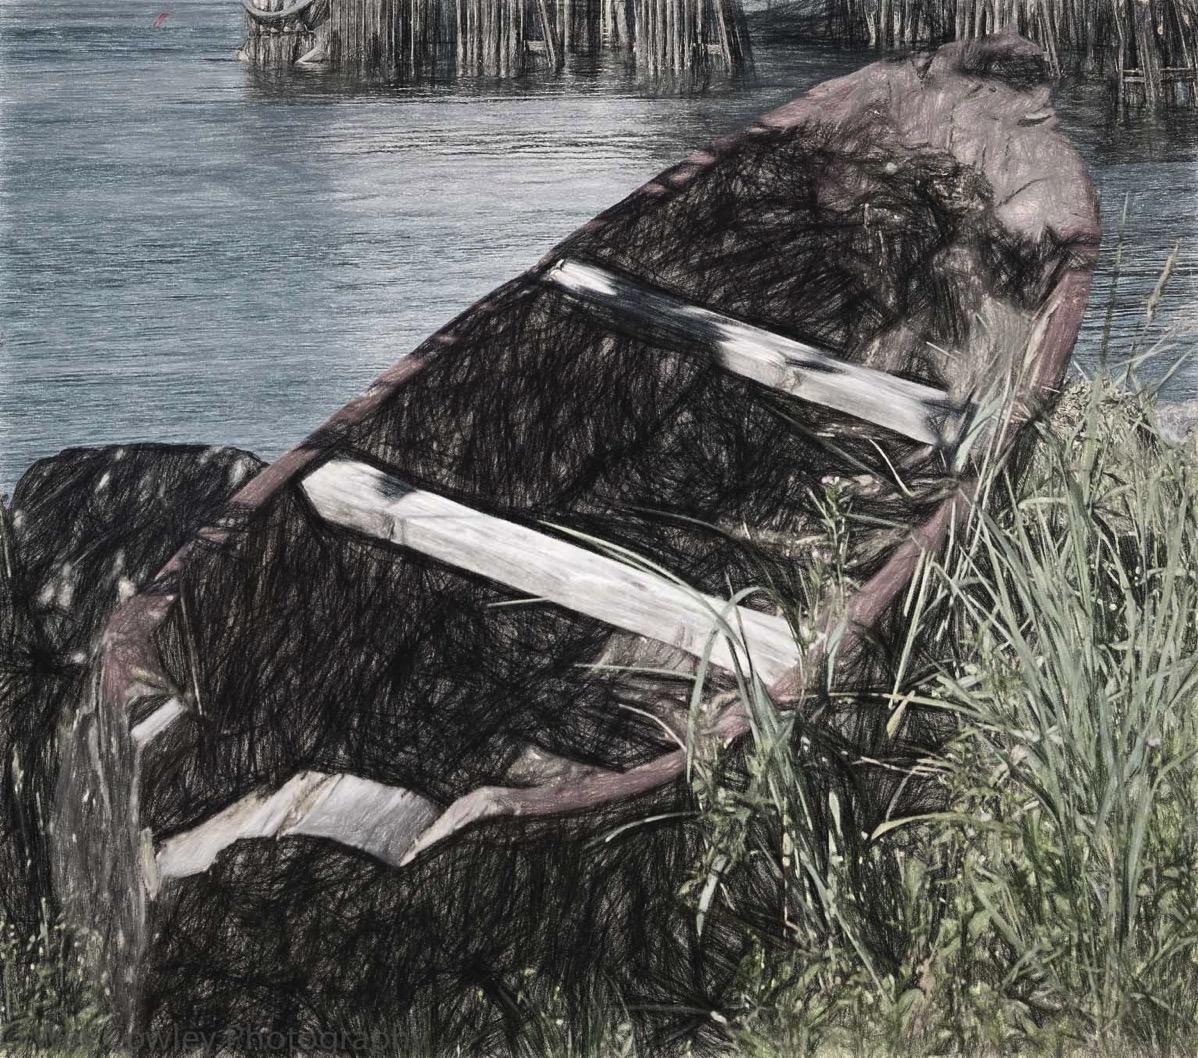 Wrangell abandoned boat sketchwork3